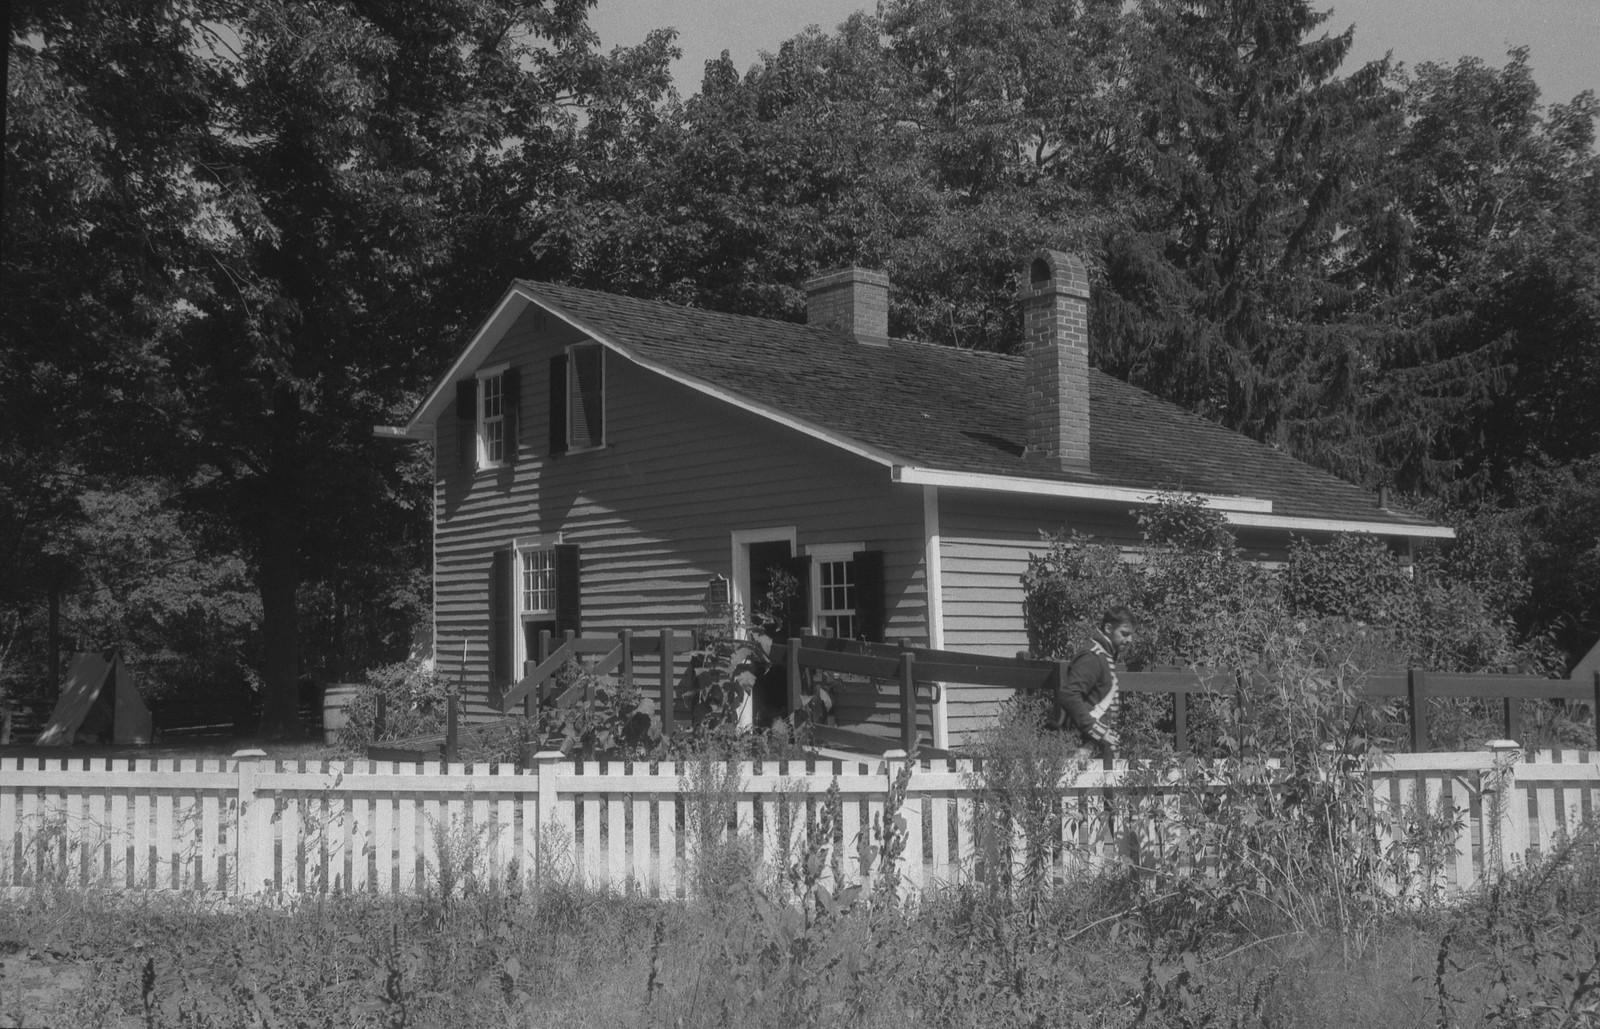 The Lewis Bradley House